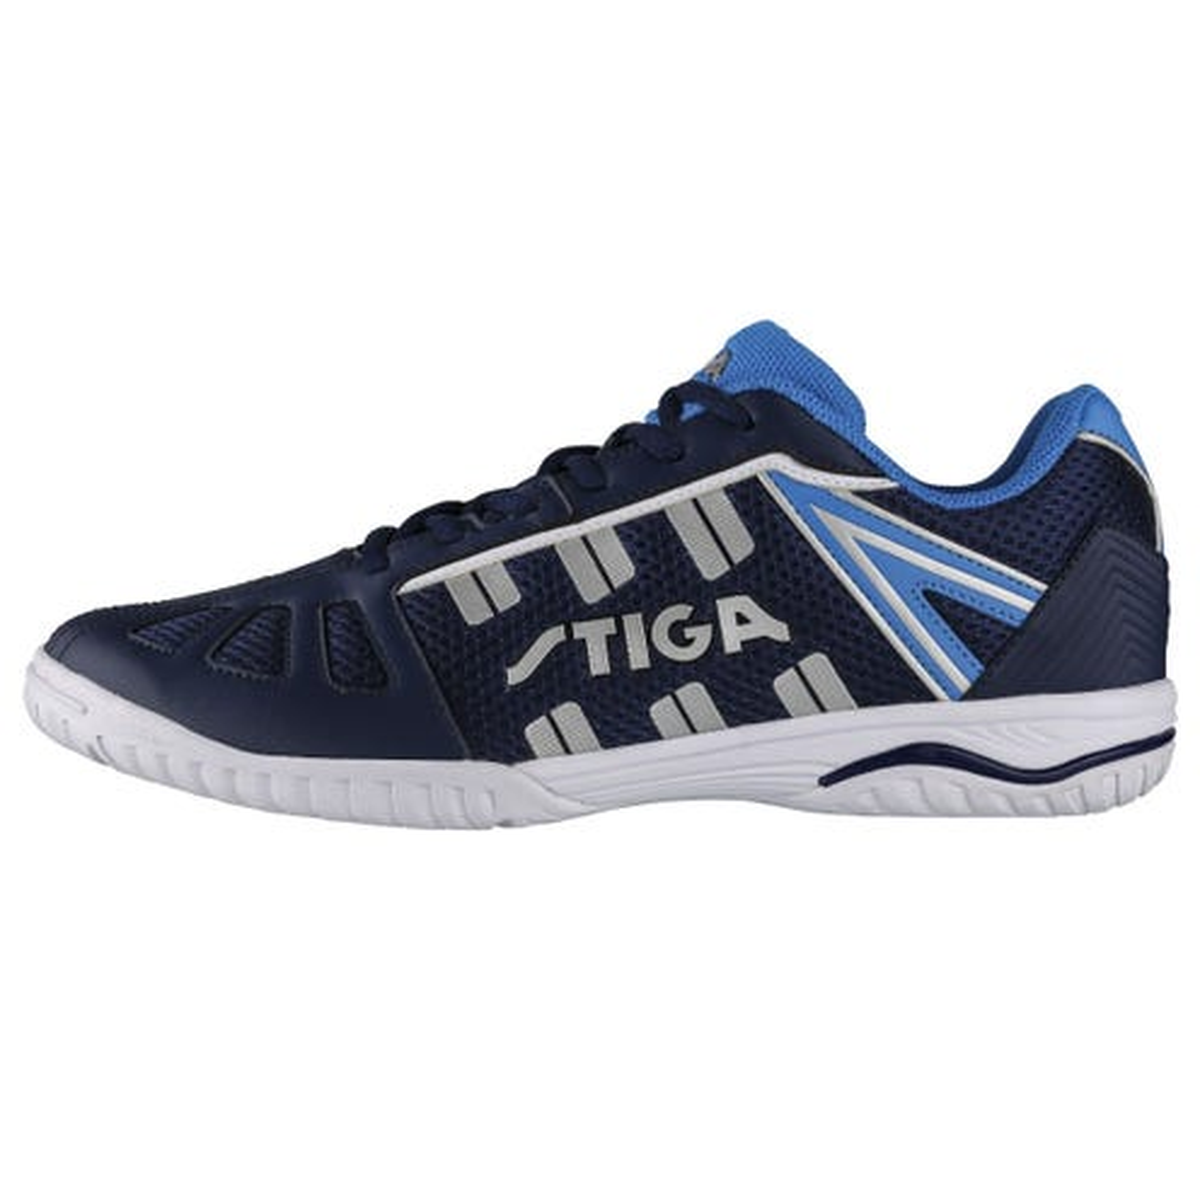 Stiga Liner III Blue